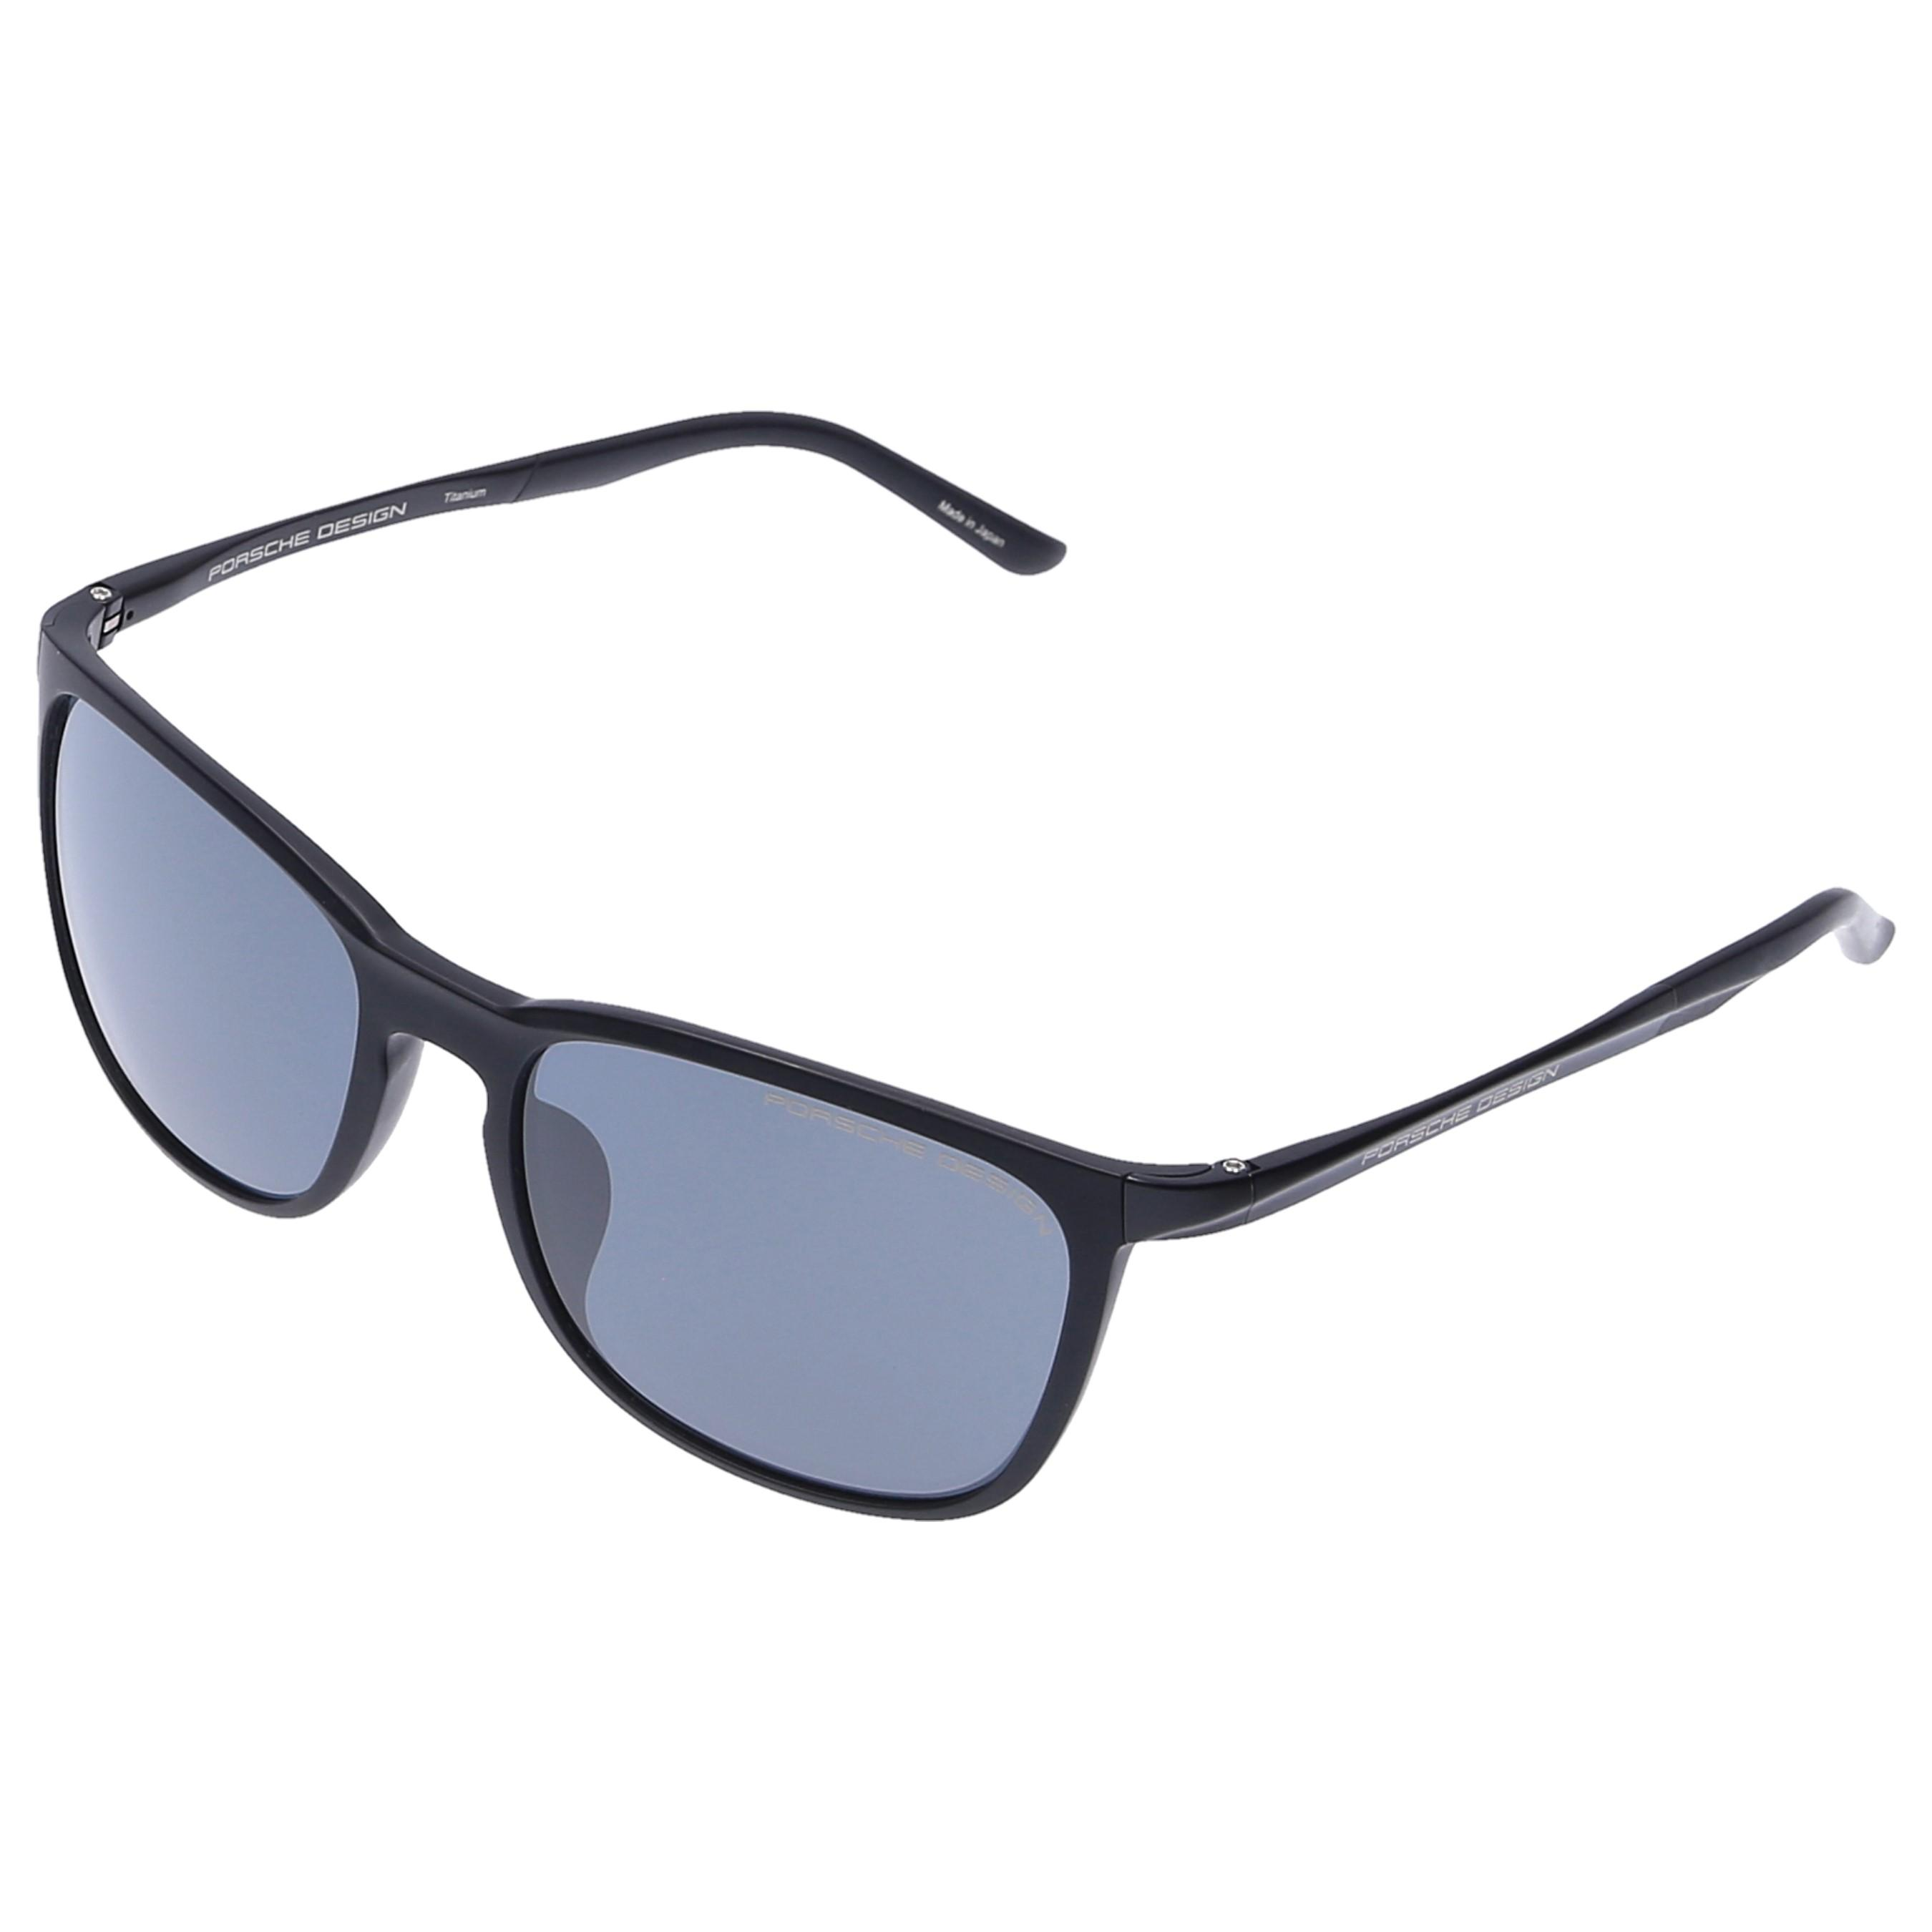 c2afc8269a9 Porsche Design - Multicolor Men Sunglasses D-fame 8673 Acetate Titanium  Black for Men -. View fullscreen